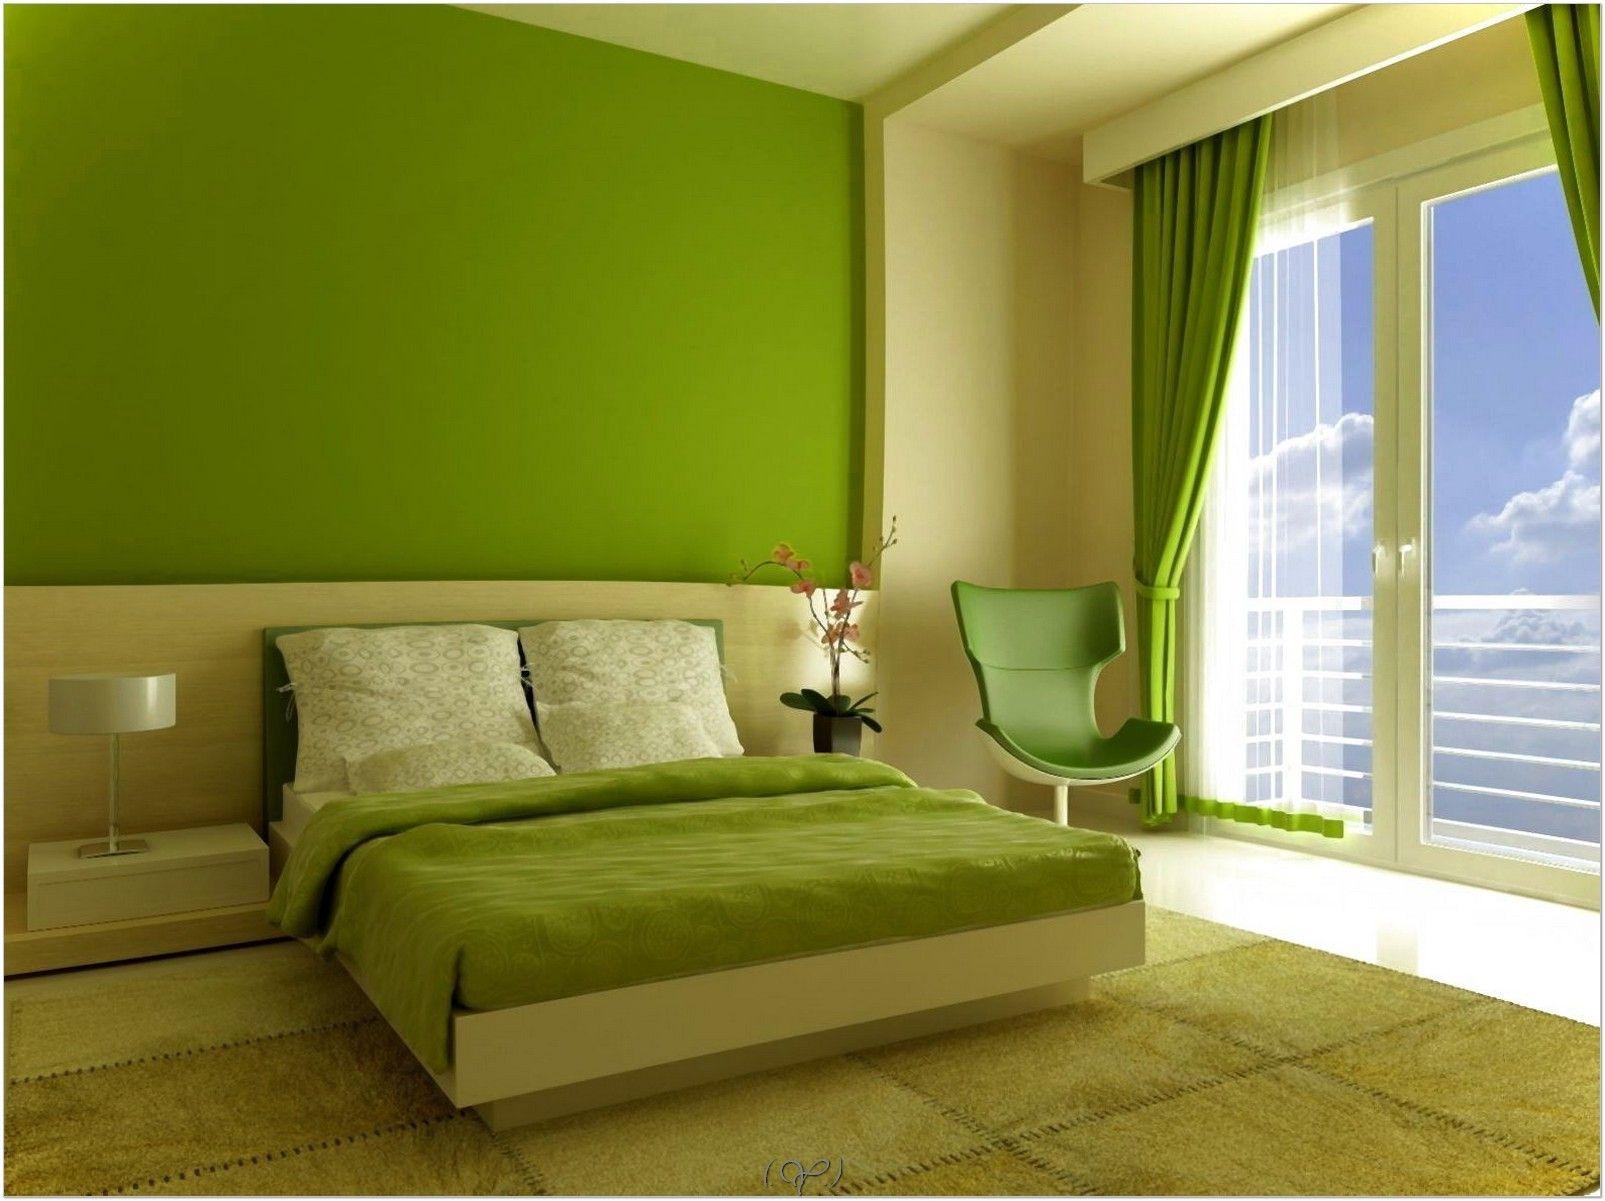 Related image Bedroom color combination, Green bedroom